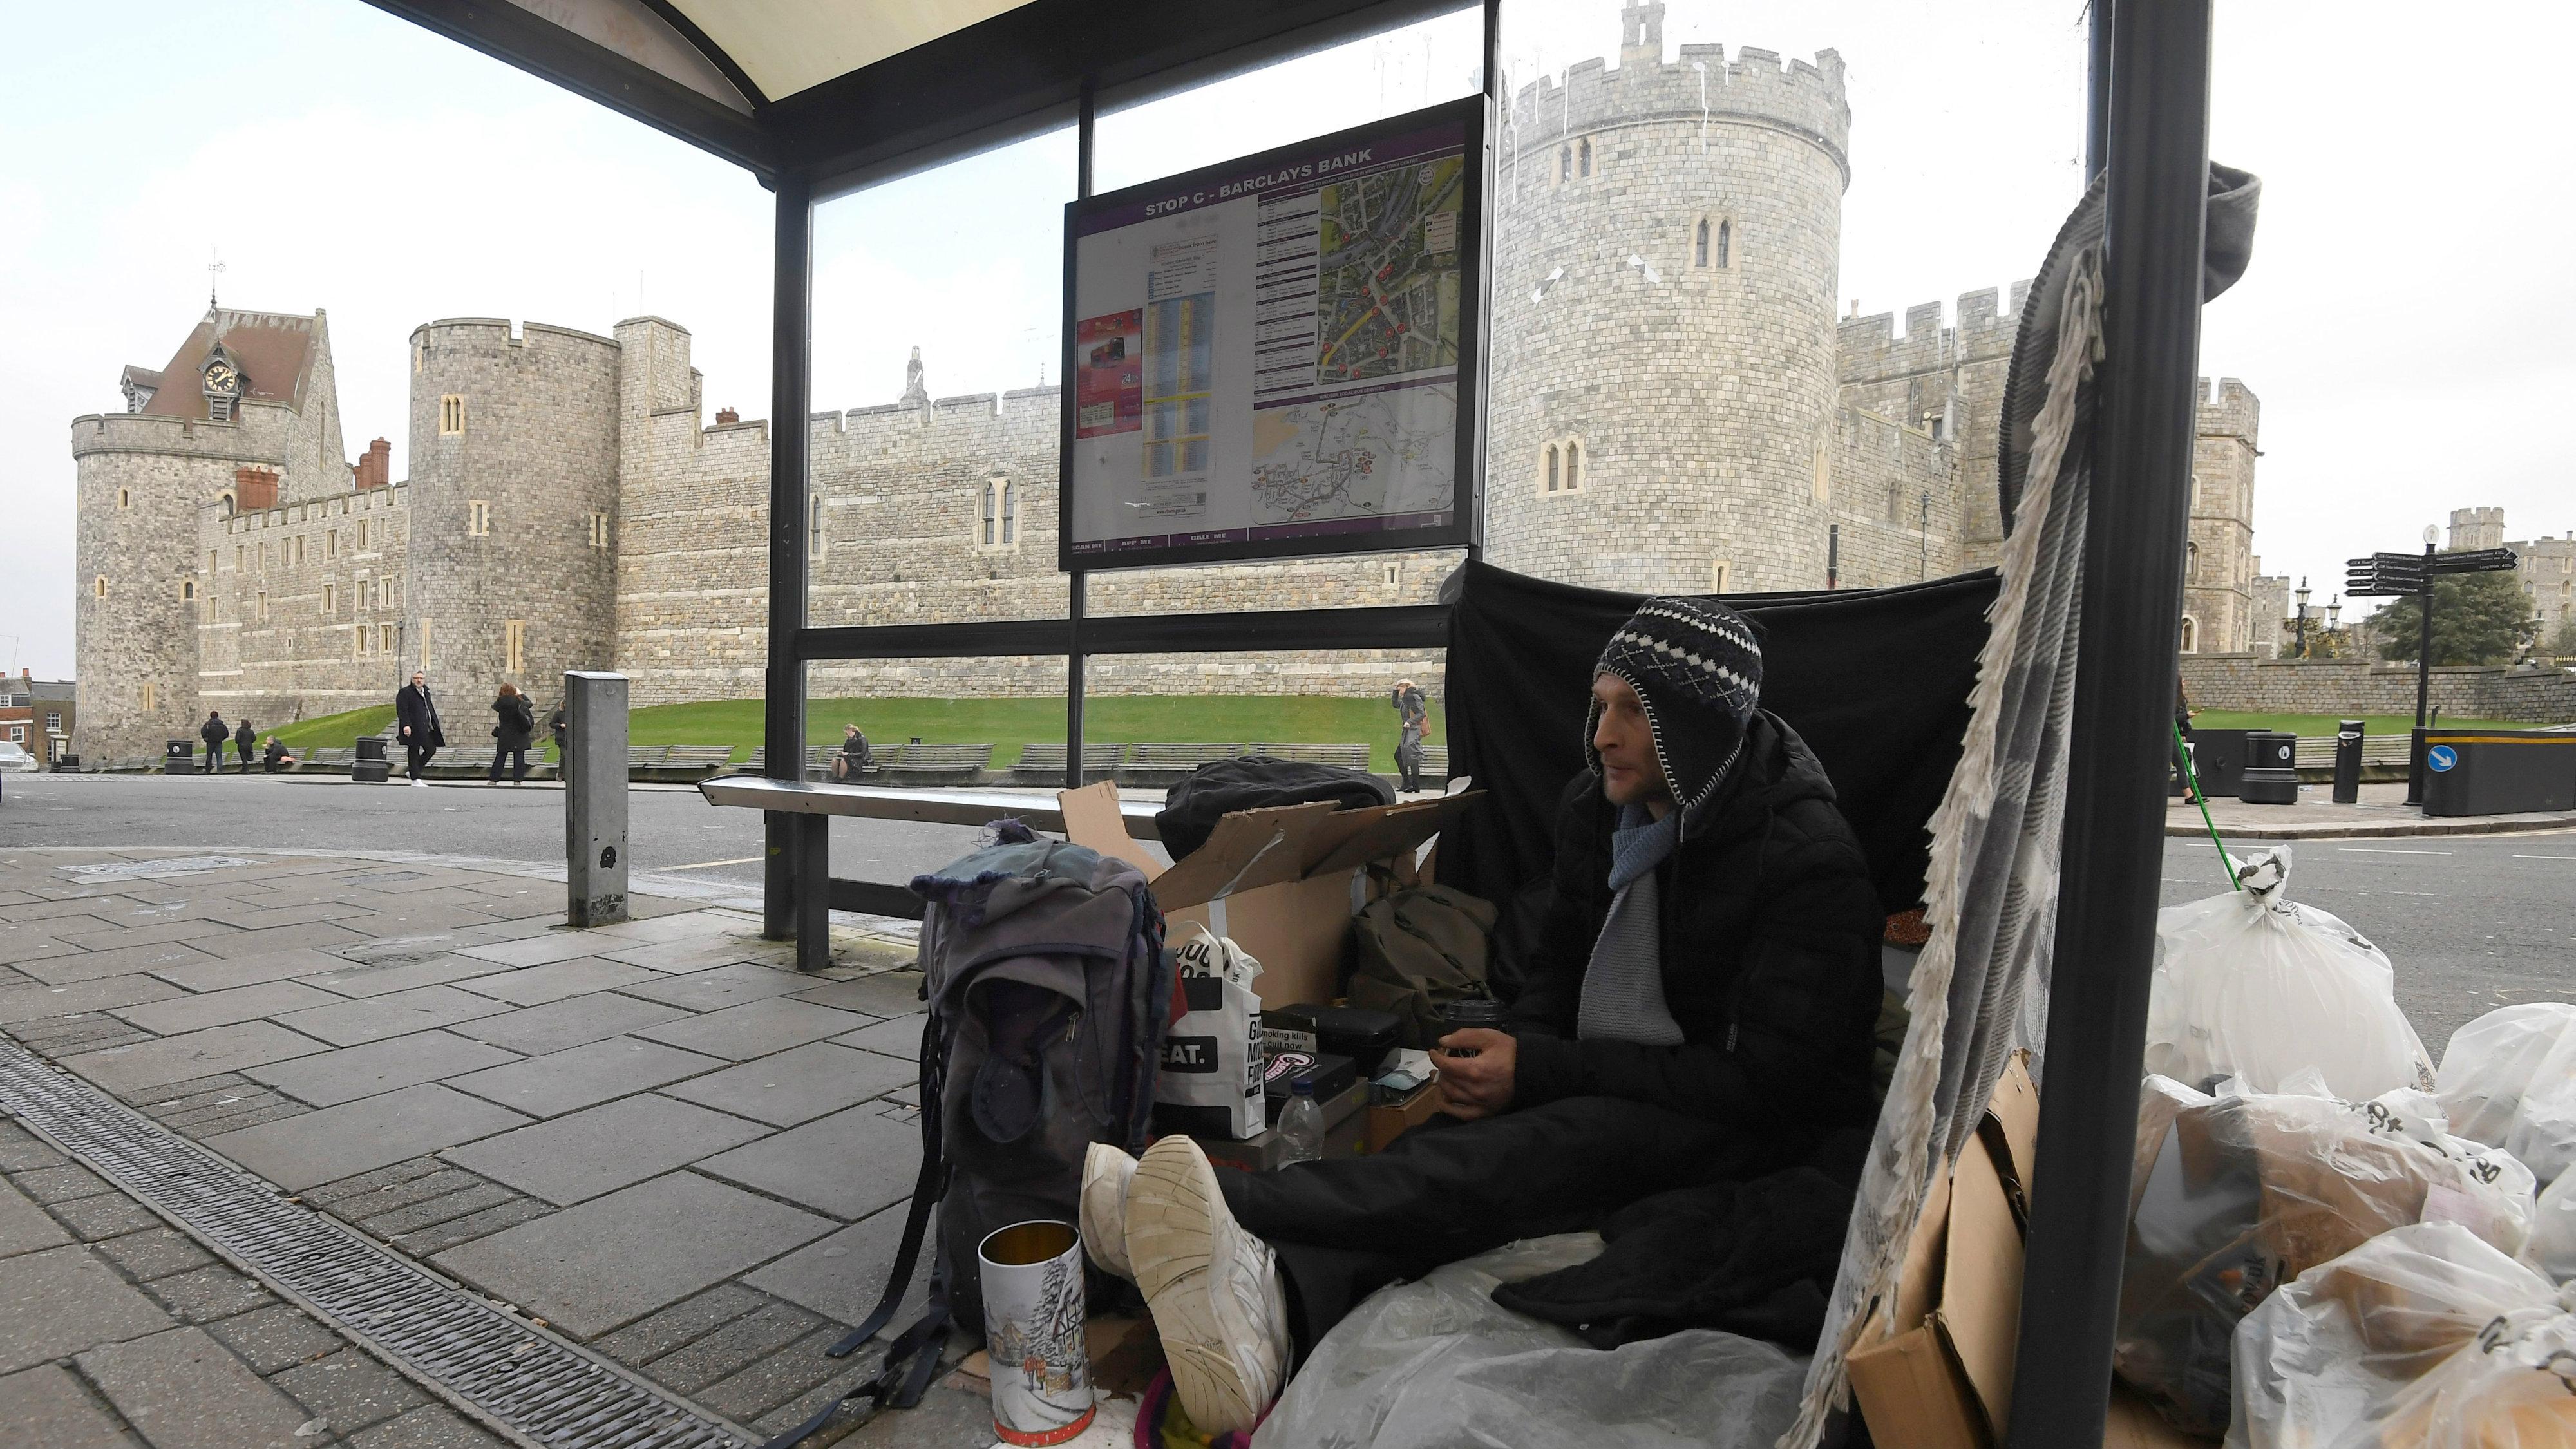 A homeless man sits under a bus shelter where he sleeps opposite Windsor Castle